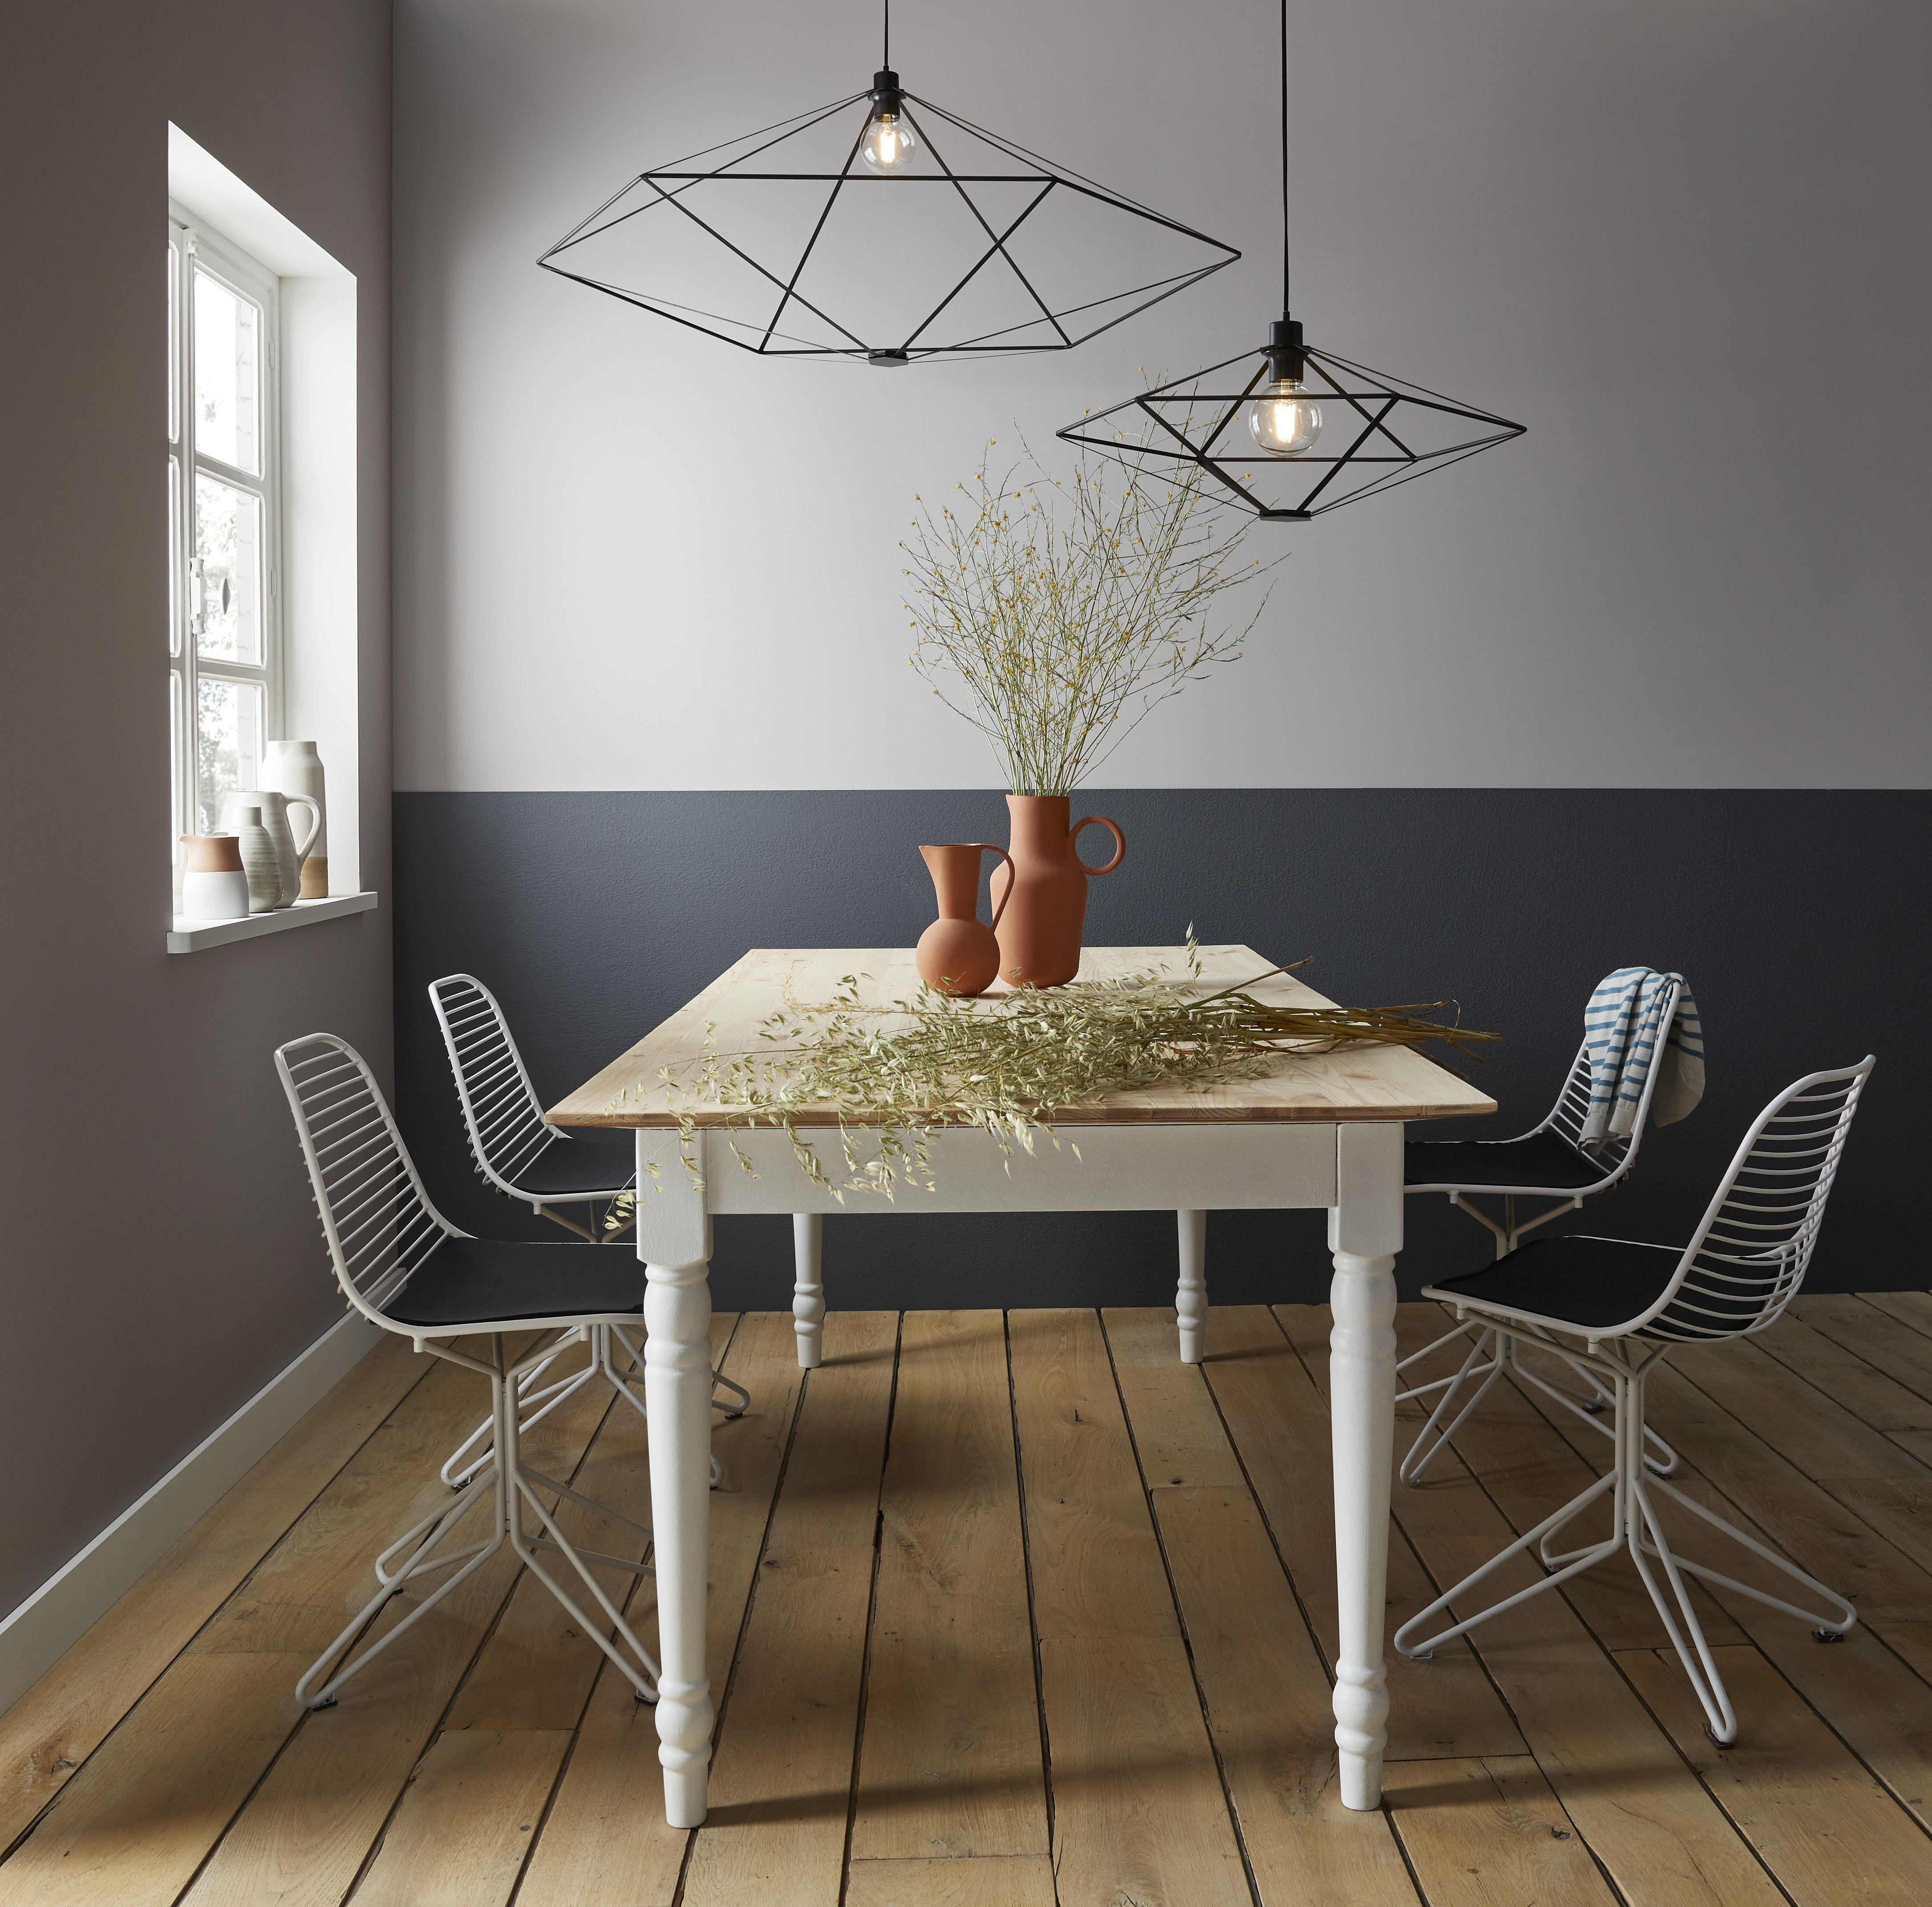 Lampa Wiszaca Goodhome Heyka 1 Punktowa E27 120 Cm Czarna Lampy Wiszace Home Decor Decor Furniture